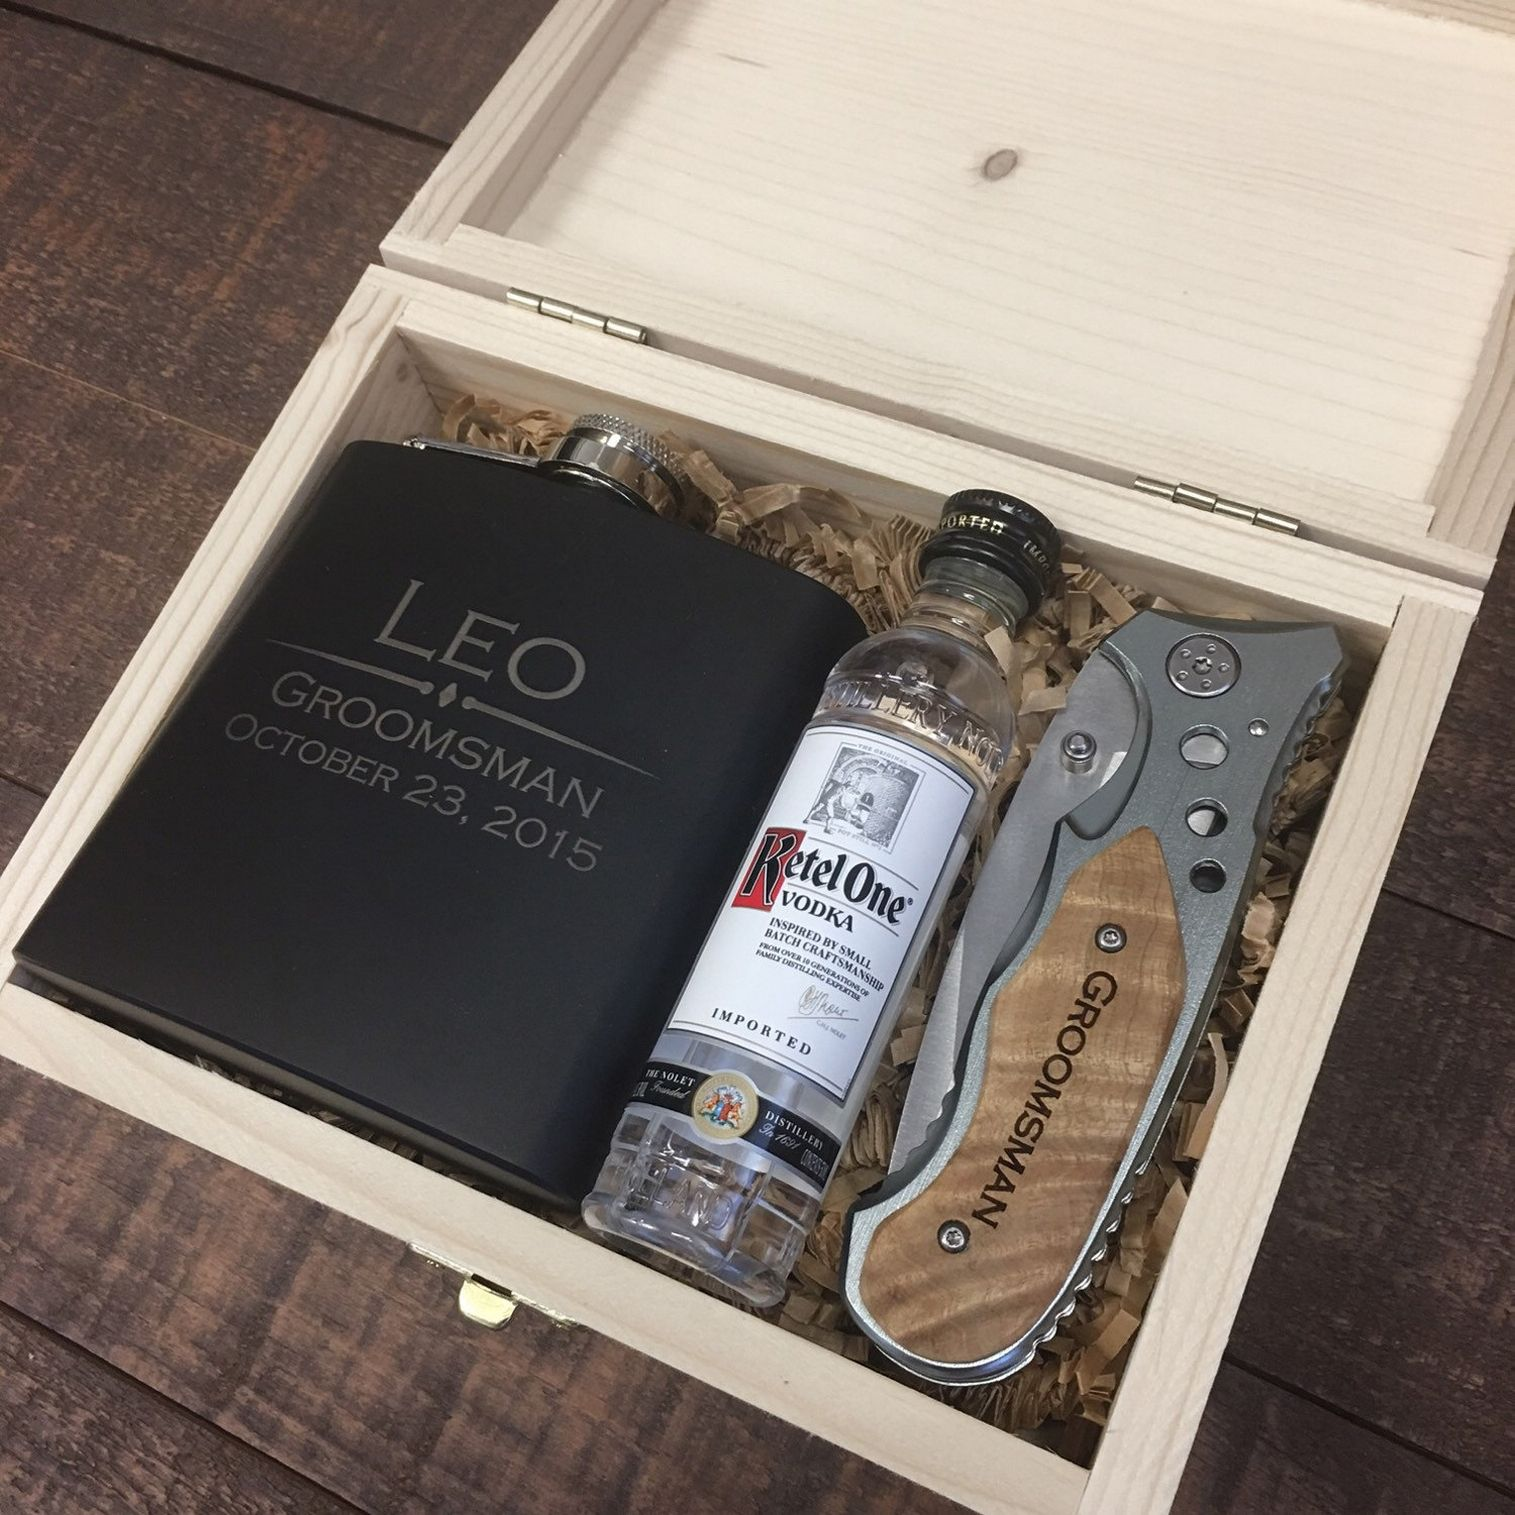 Unique Groomsmen Gifts Ideas https://bridalore.com/2017/06/02/unique-groomsmen-gifts-ideas/